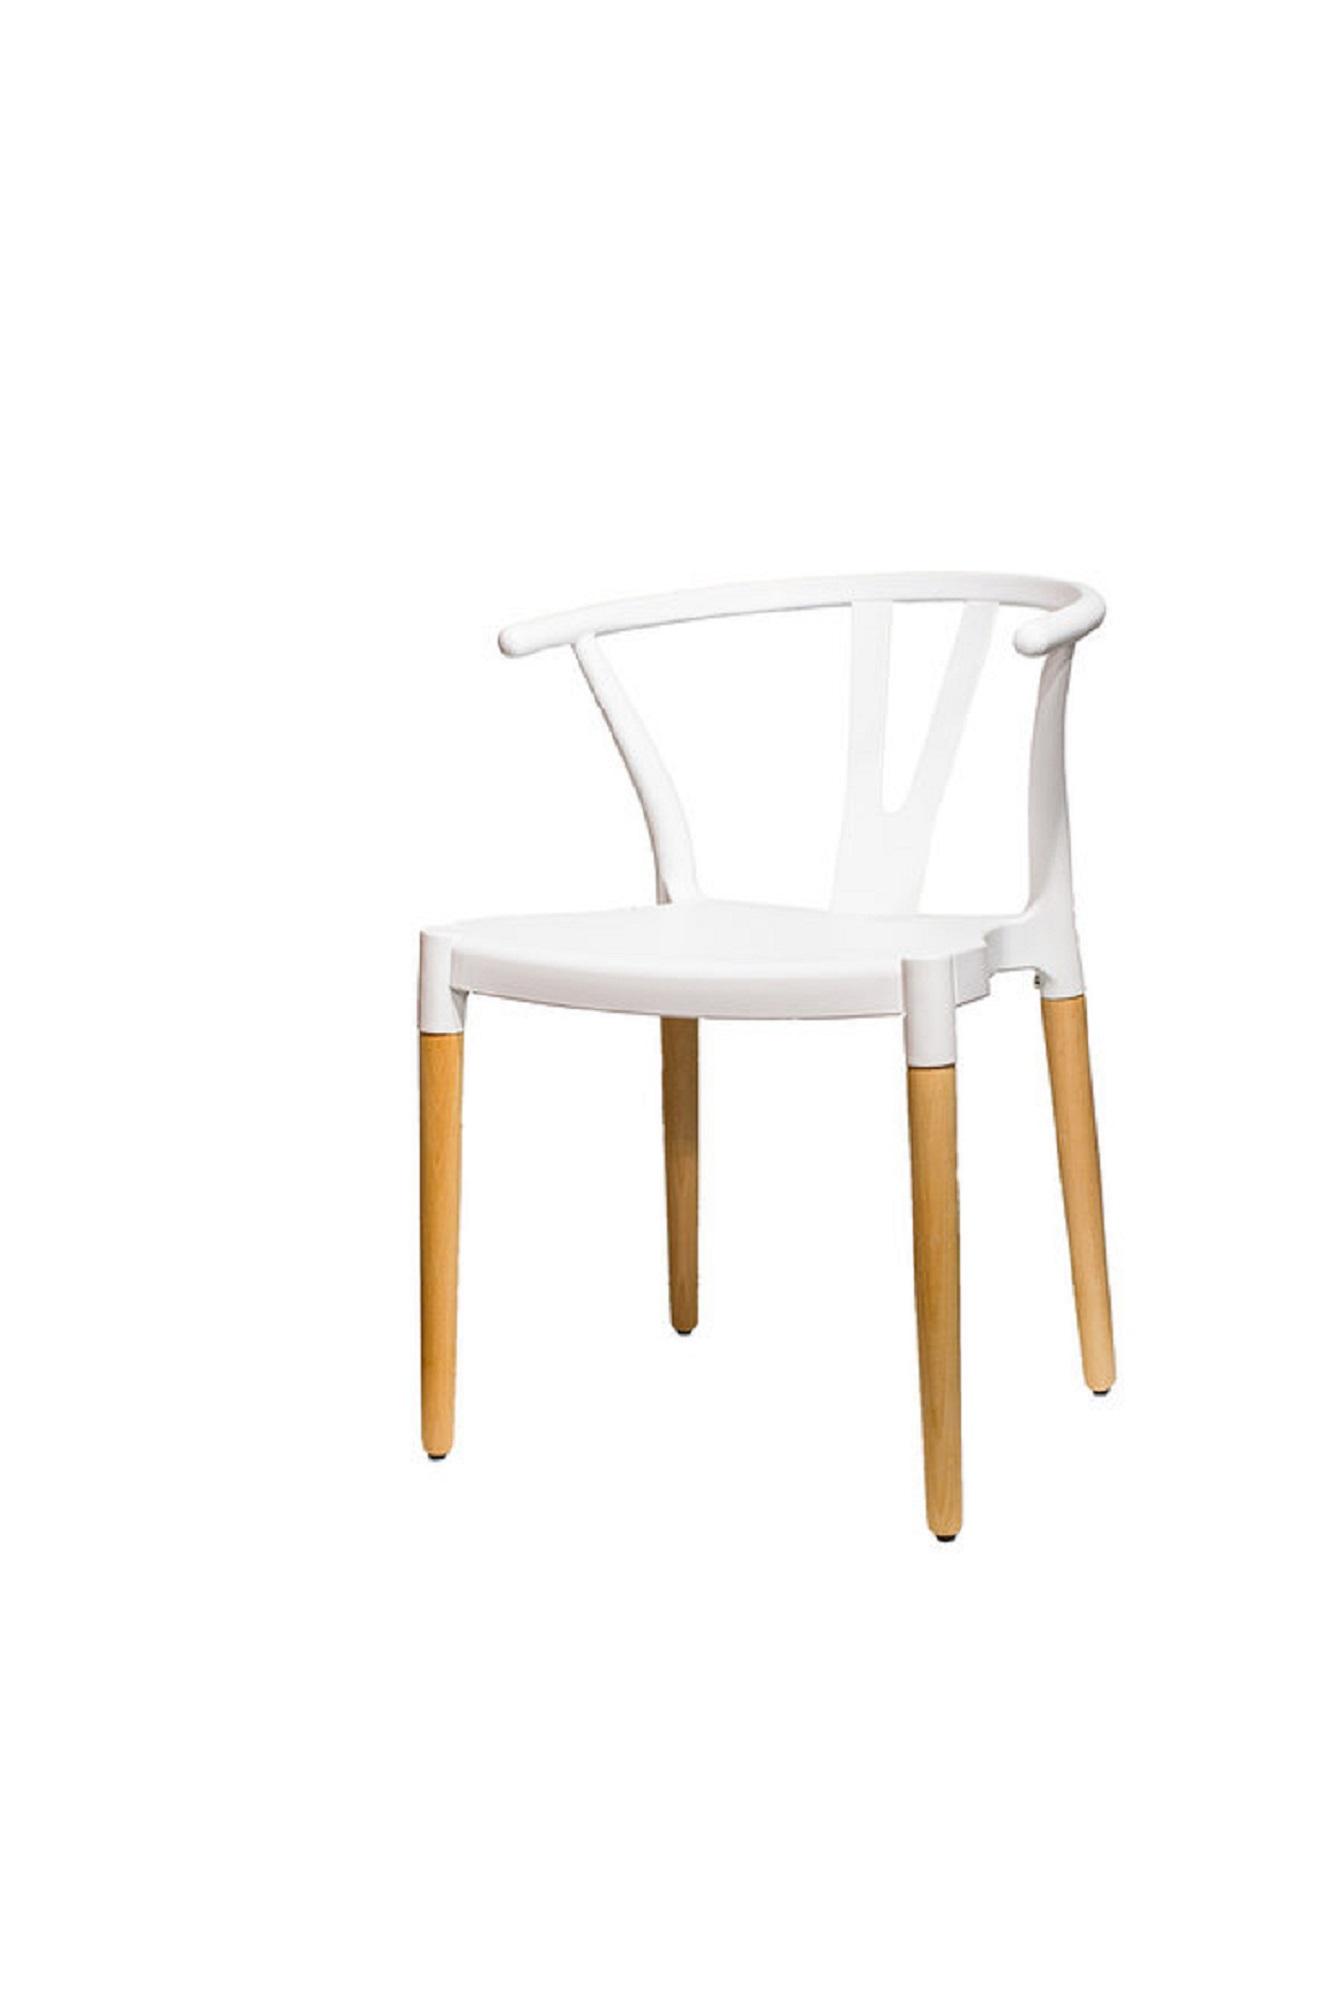 пластиковый стул «HE Wishbone»